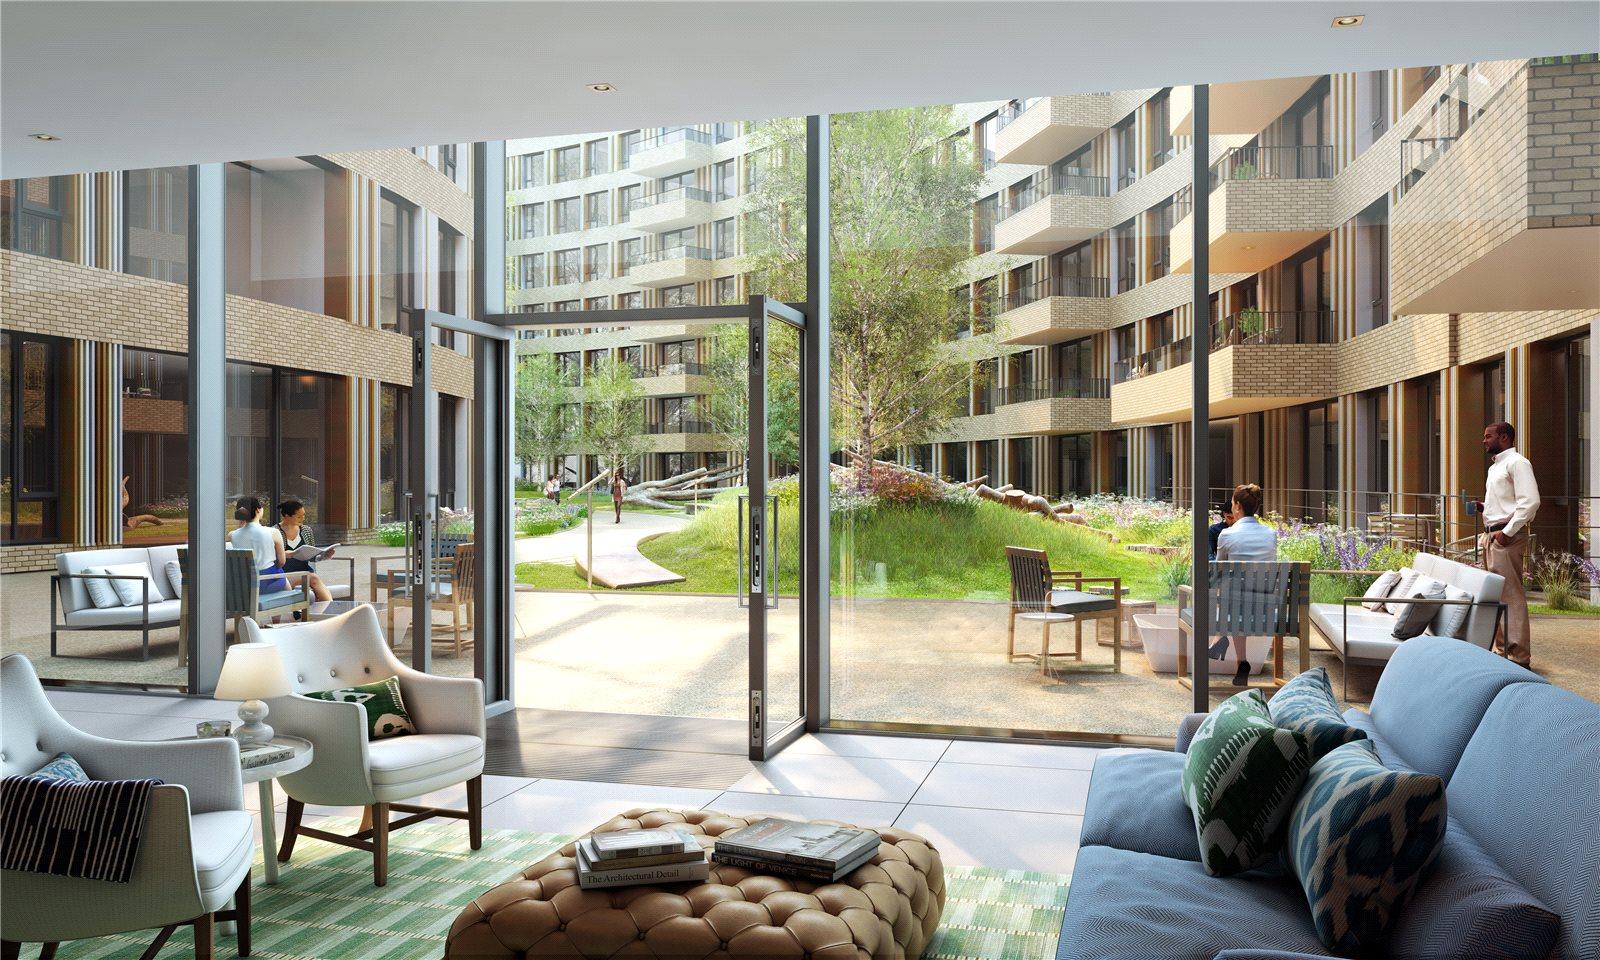 Апартаменты / Квартиры для того Продажа на Television Centre, 101 Wood Lane, London, W12 London, Англия